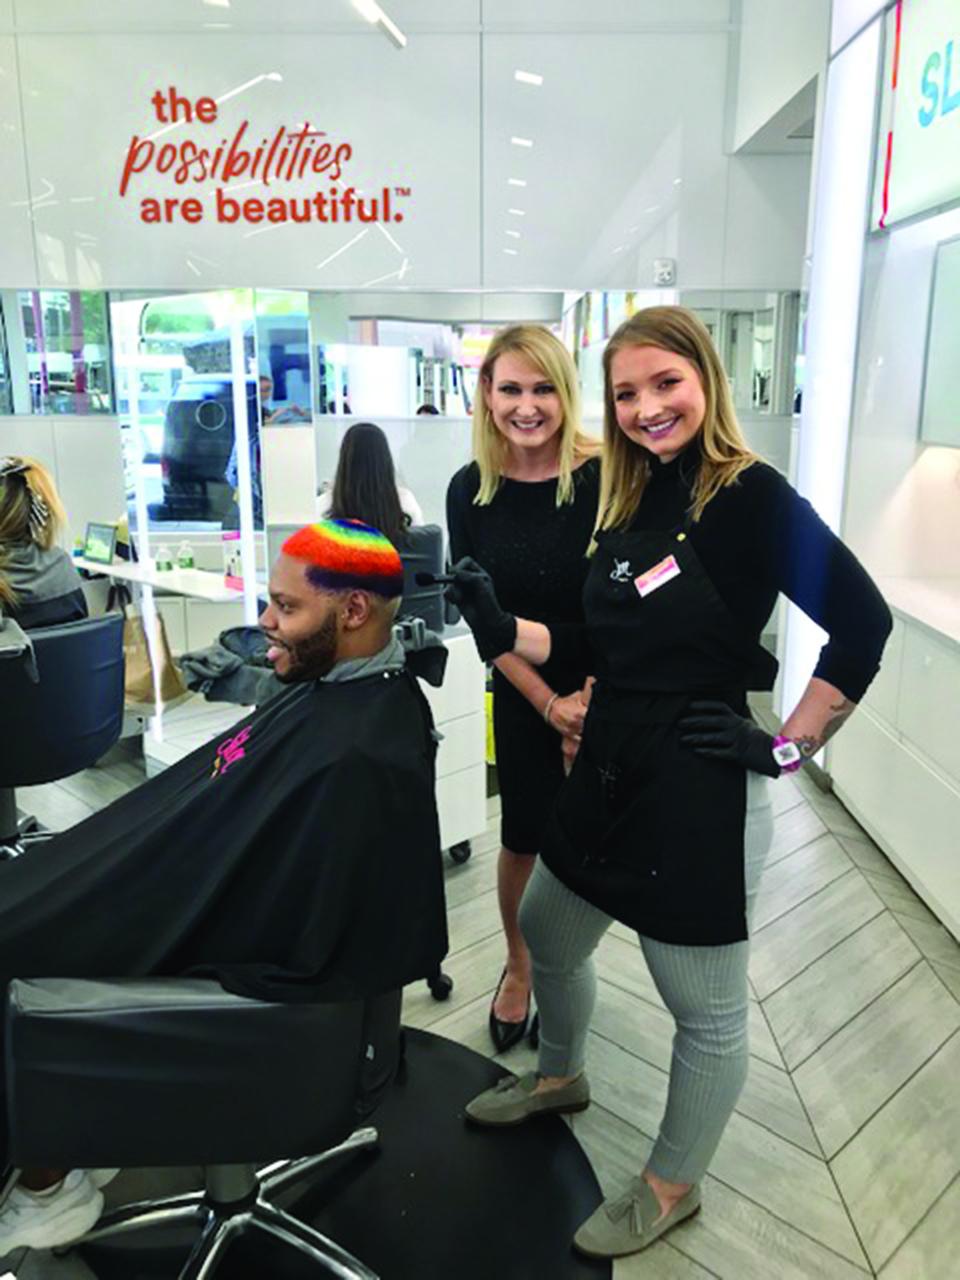 Salon Services Drive Career Success and Culture at Ulta Beauty